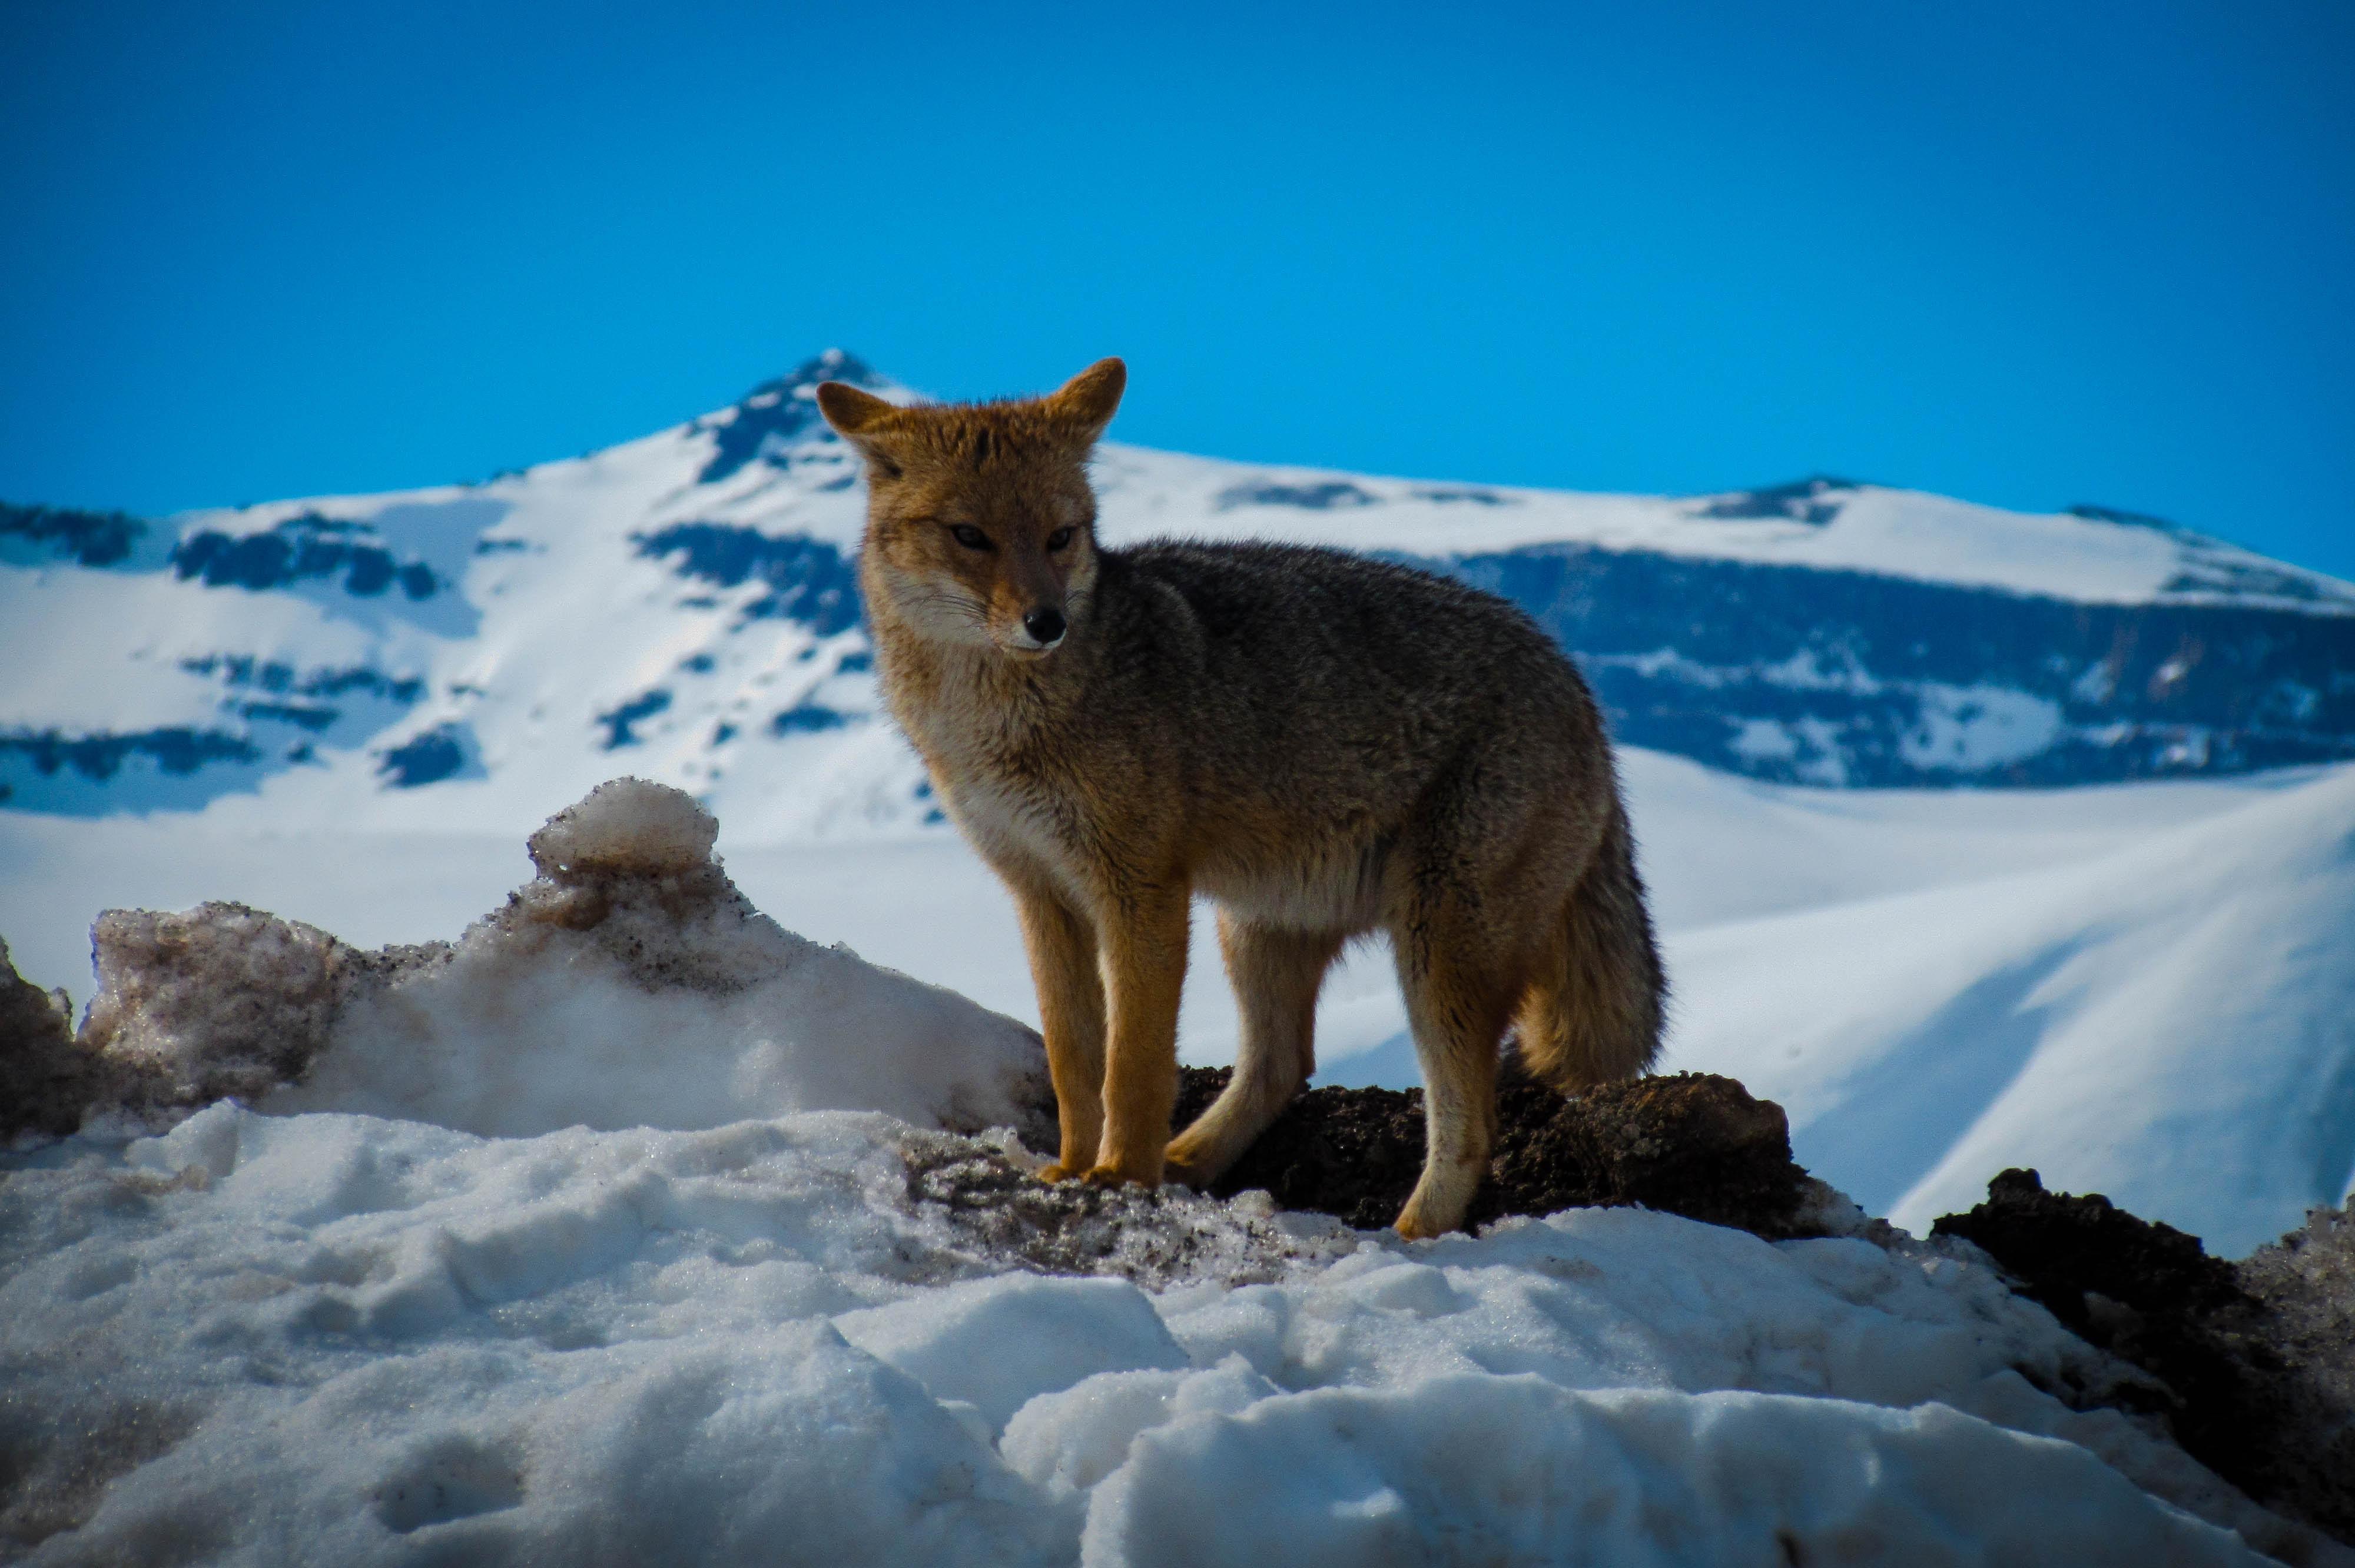 red fox near snowy mountain under blue sky